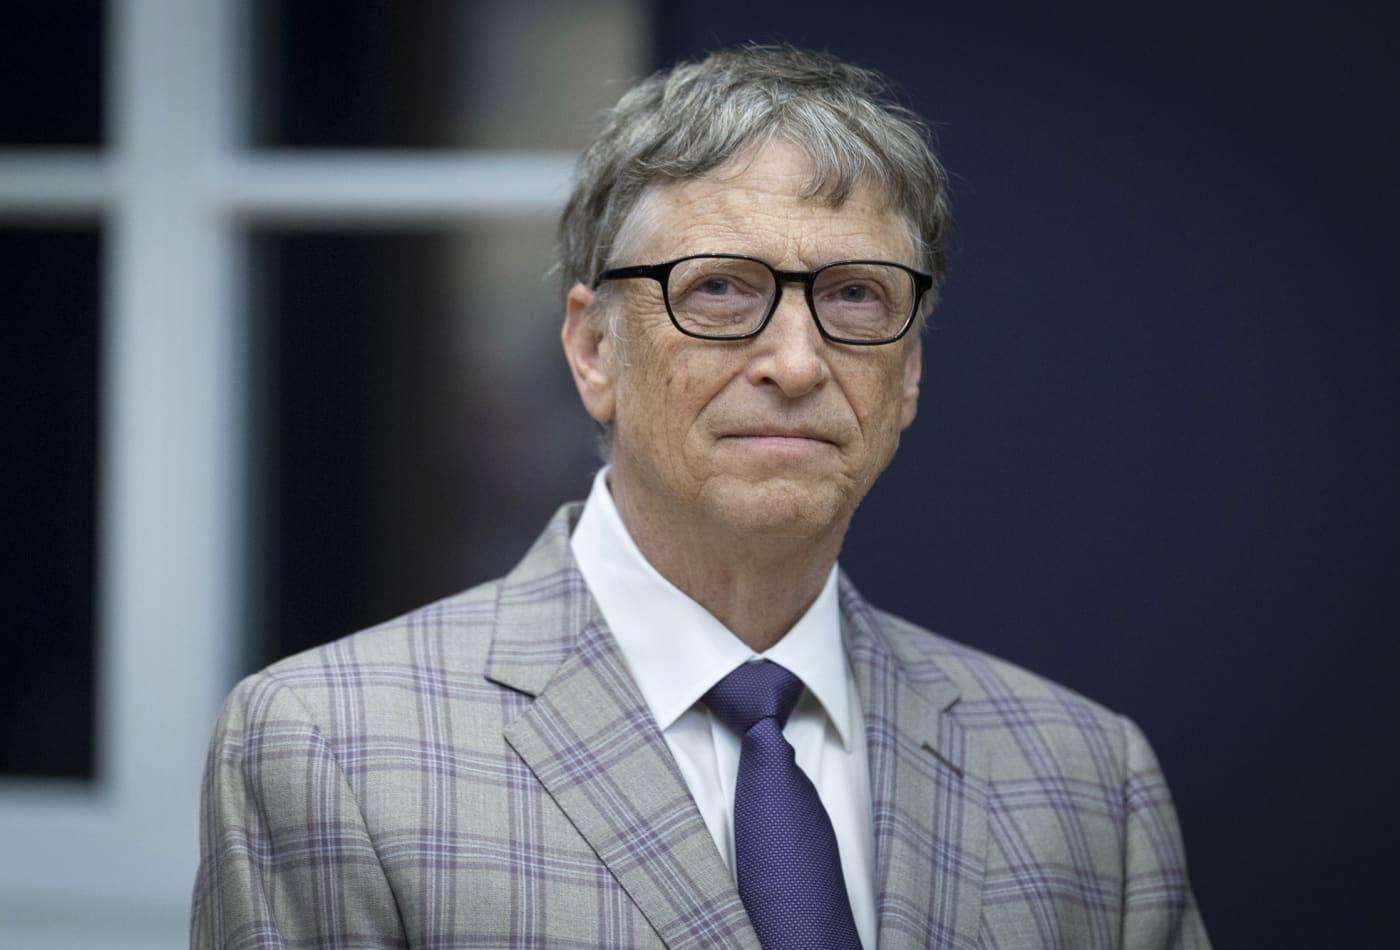 Bill Gates: US college dropout rates are 'tragic'